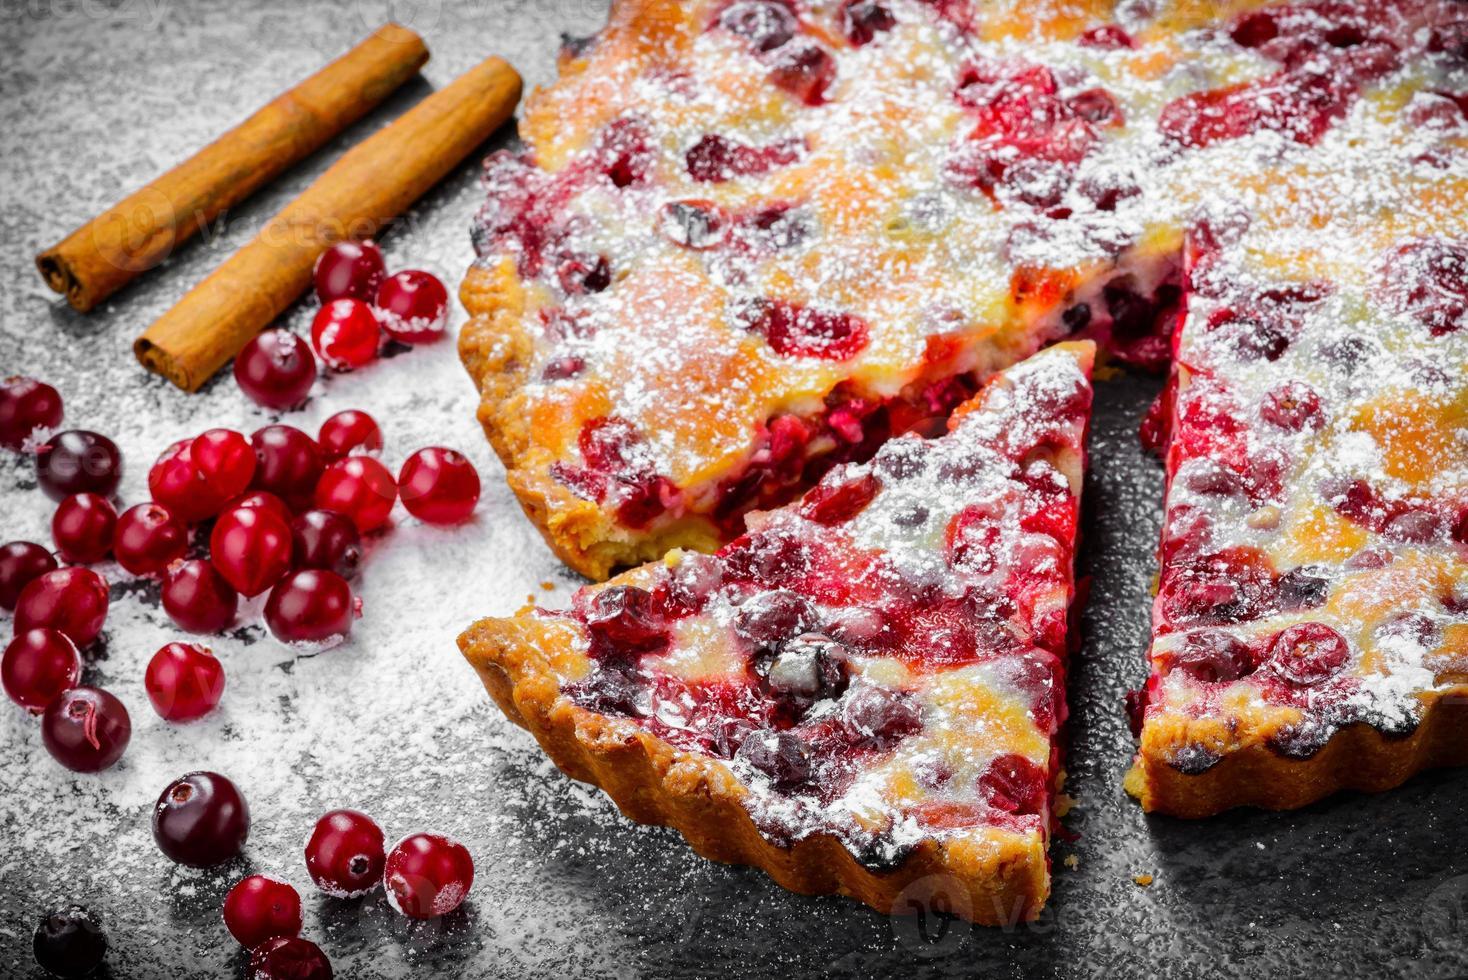 torta de cranberry closeup em fundo cinza foto